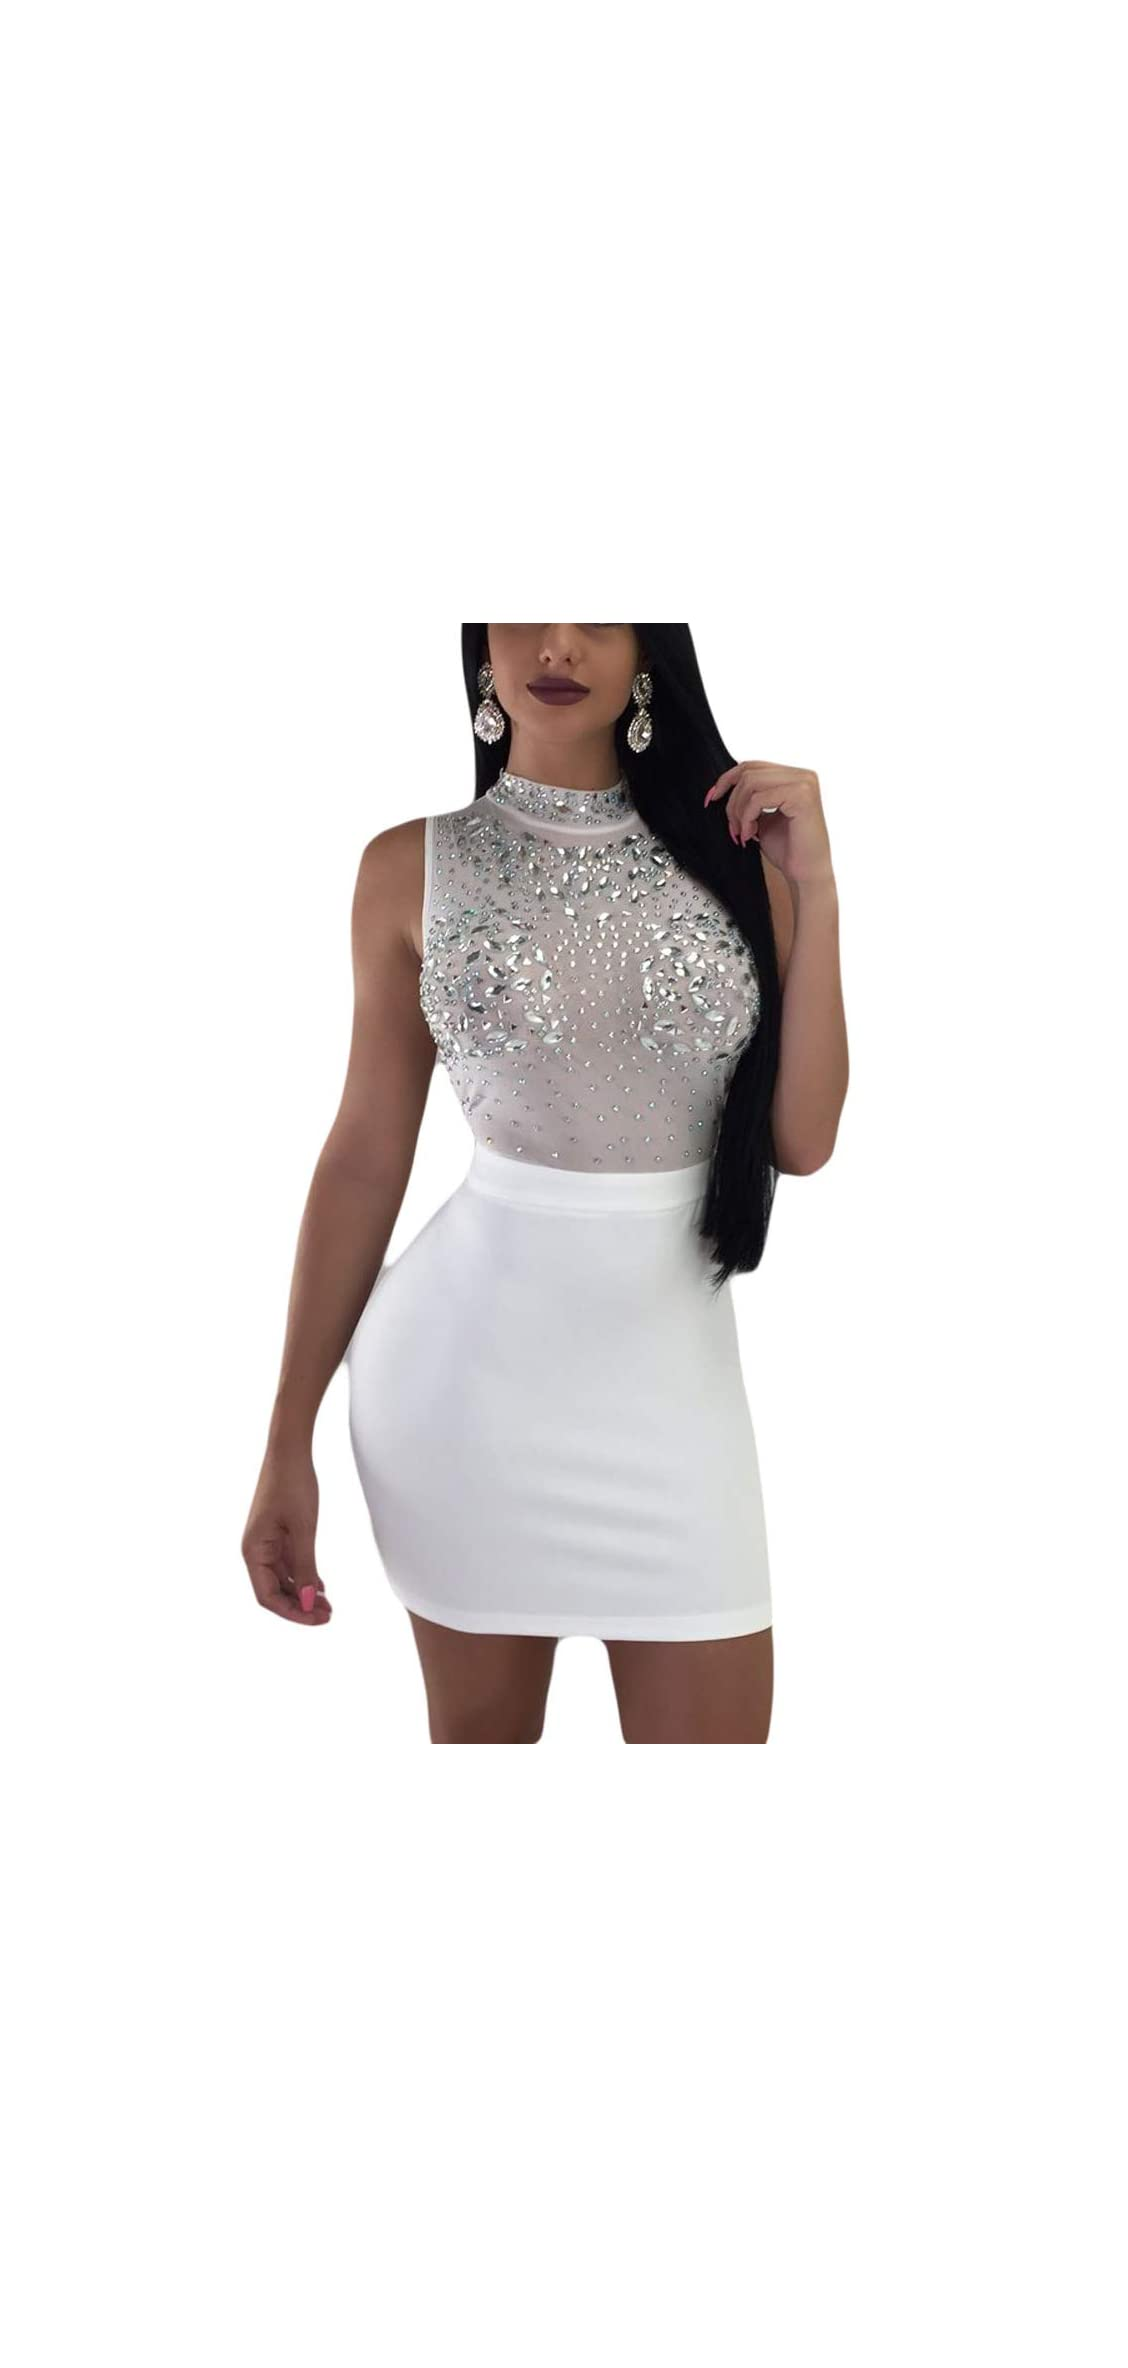 Women's Rhinestone Bodycon Mini Dress - Sexy Sleeveless Mesh See